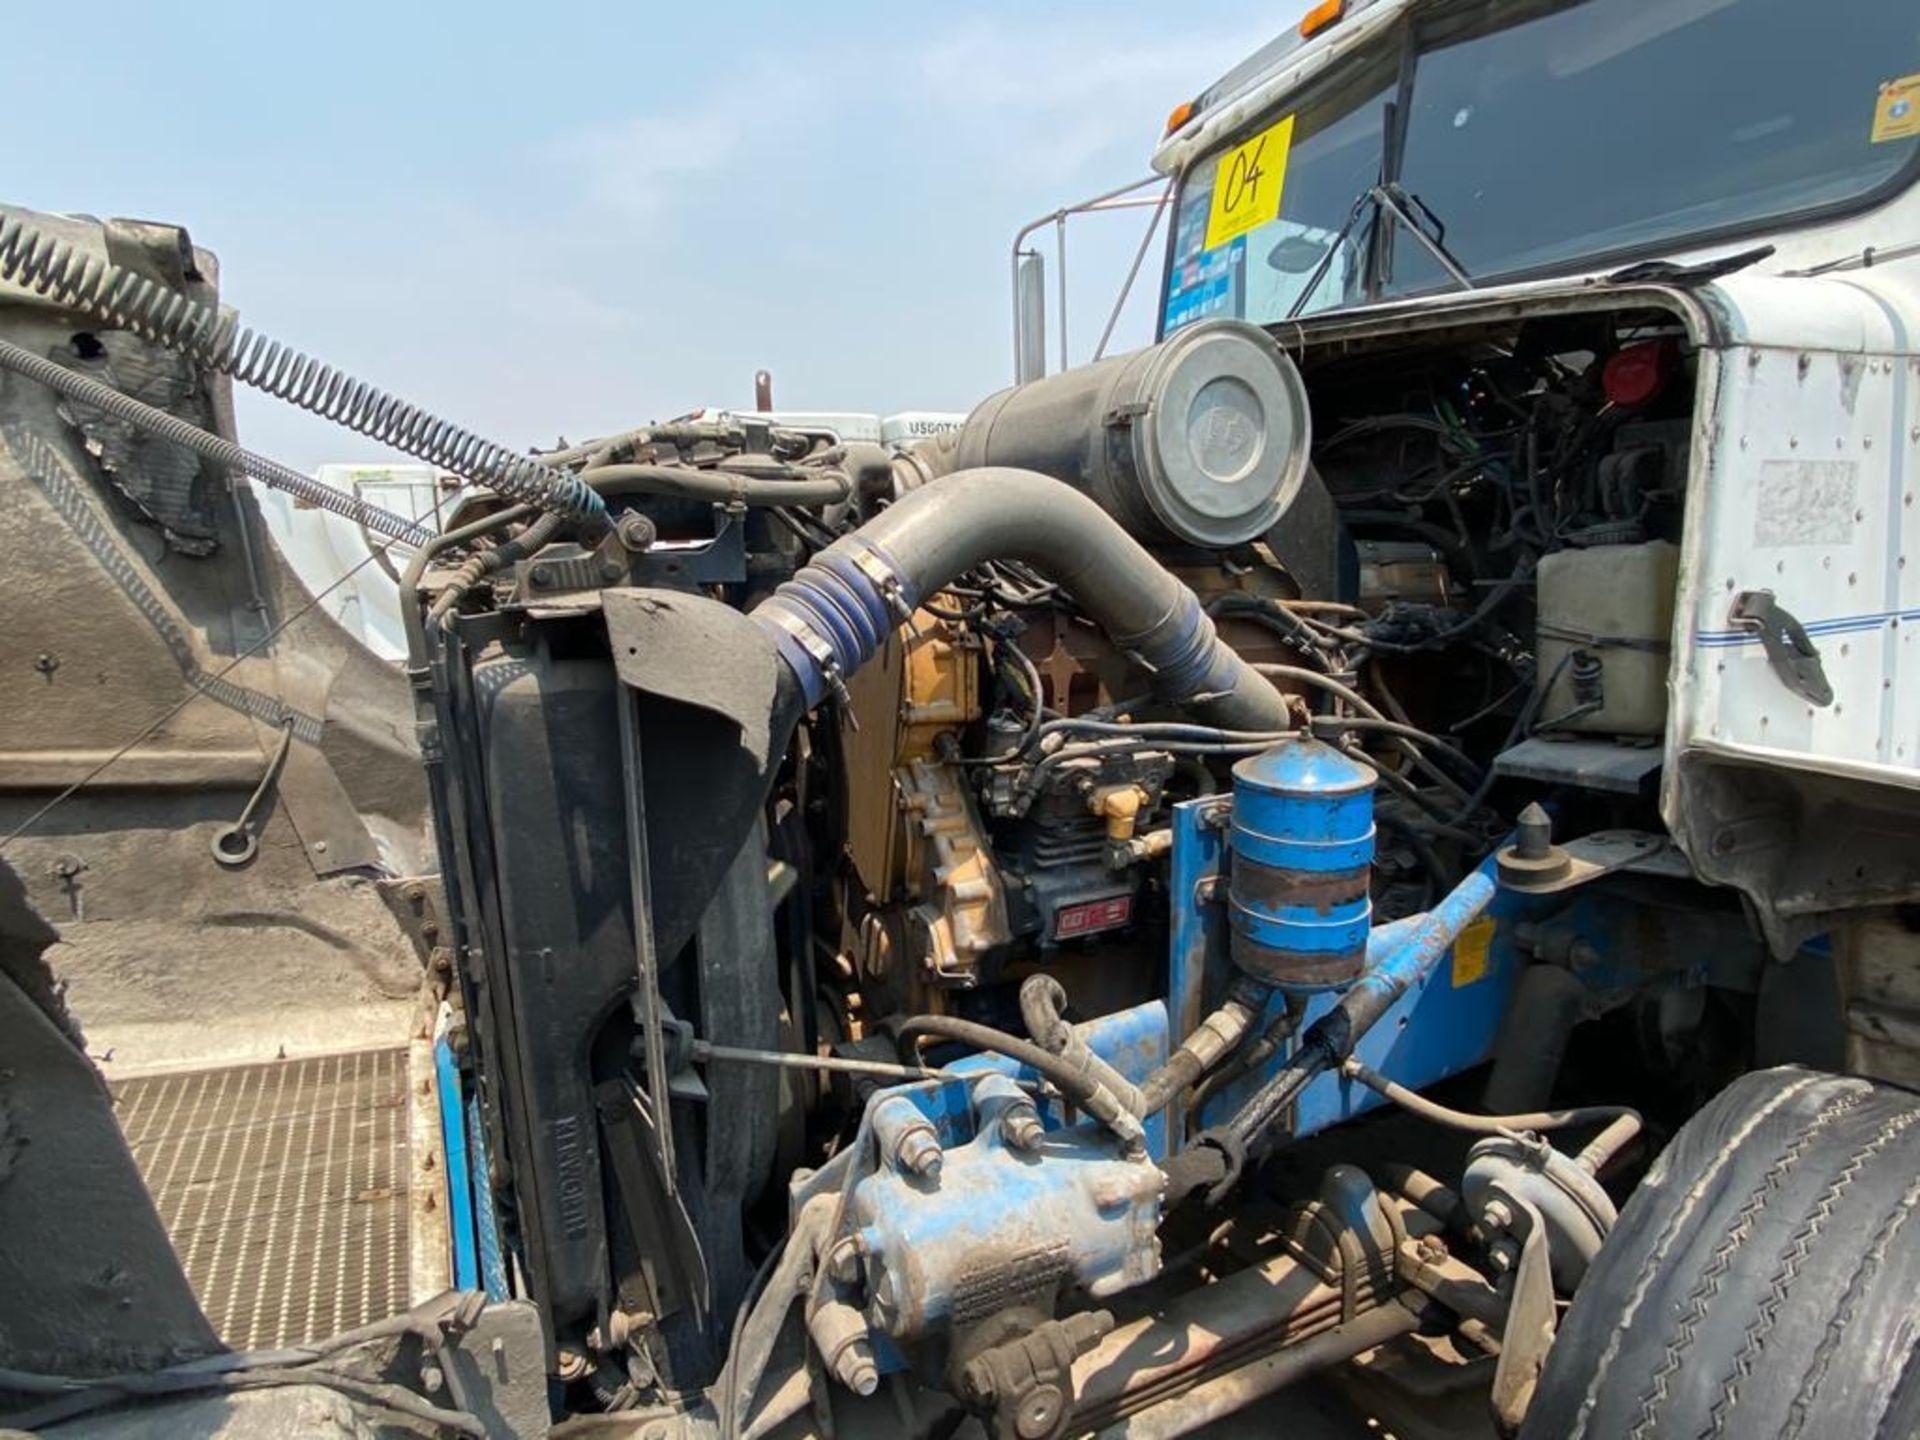 1999 Kenworth Sleeper truck tractor, standard transmission of 18 speeds - Image 57 of 70